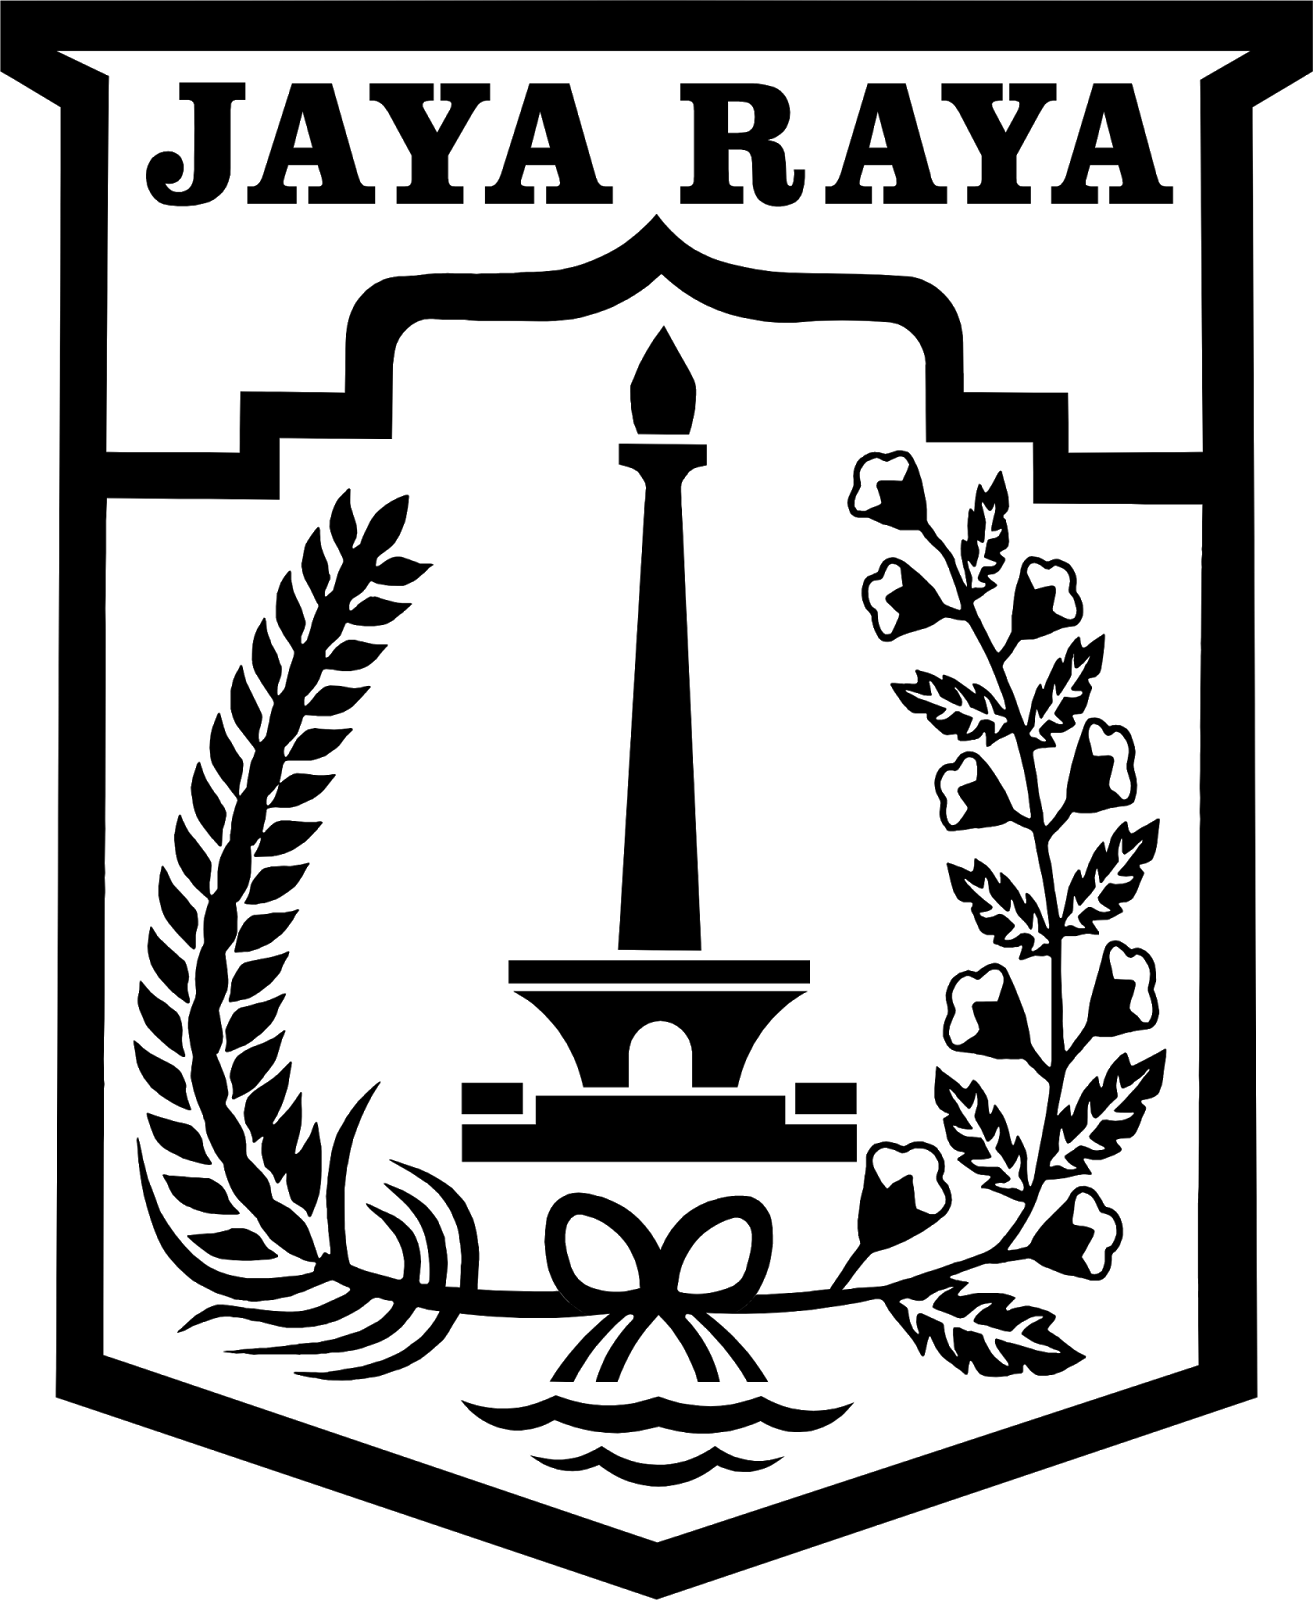 Desain Logo DKI Jakarta Hitam Putih PNG  Desain Grafis